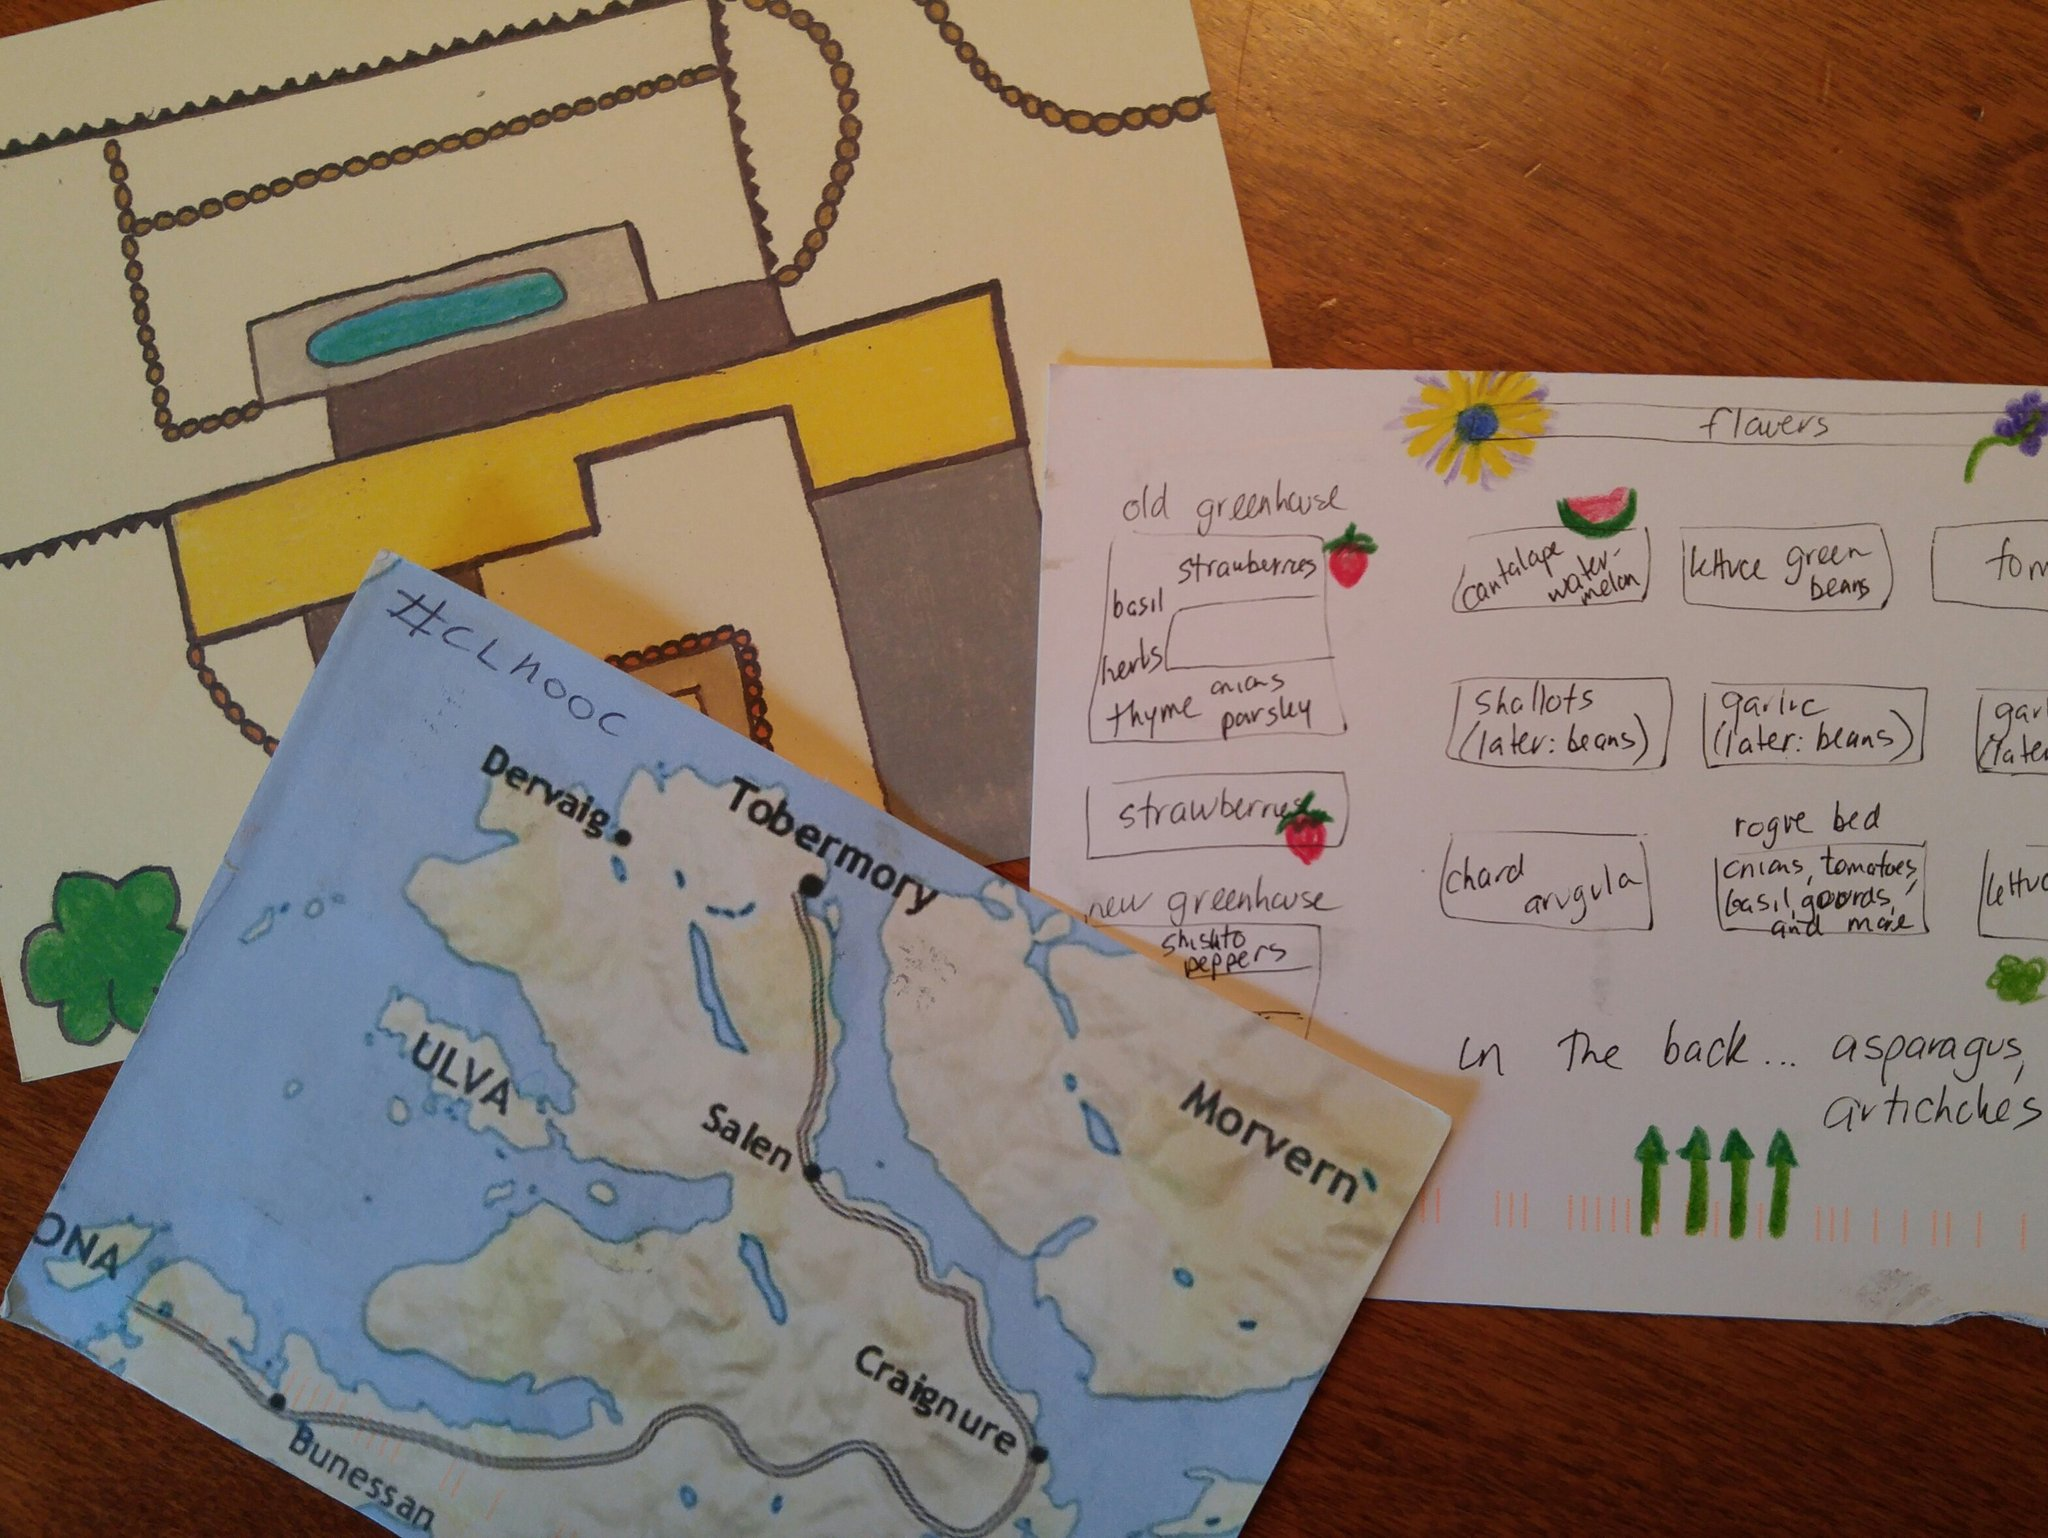 Another #clmooc #postcard bounty has arrived! Thanks, @NomadWarMachine, @kfasimpaur and Kristen! https://t.co/TunIQrpdpQ